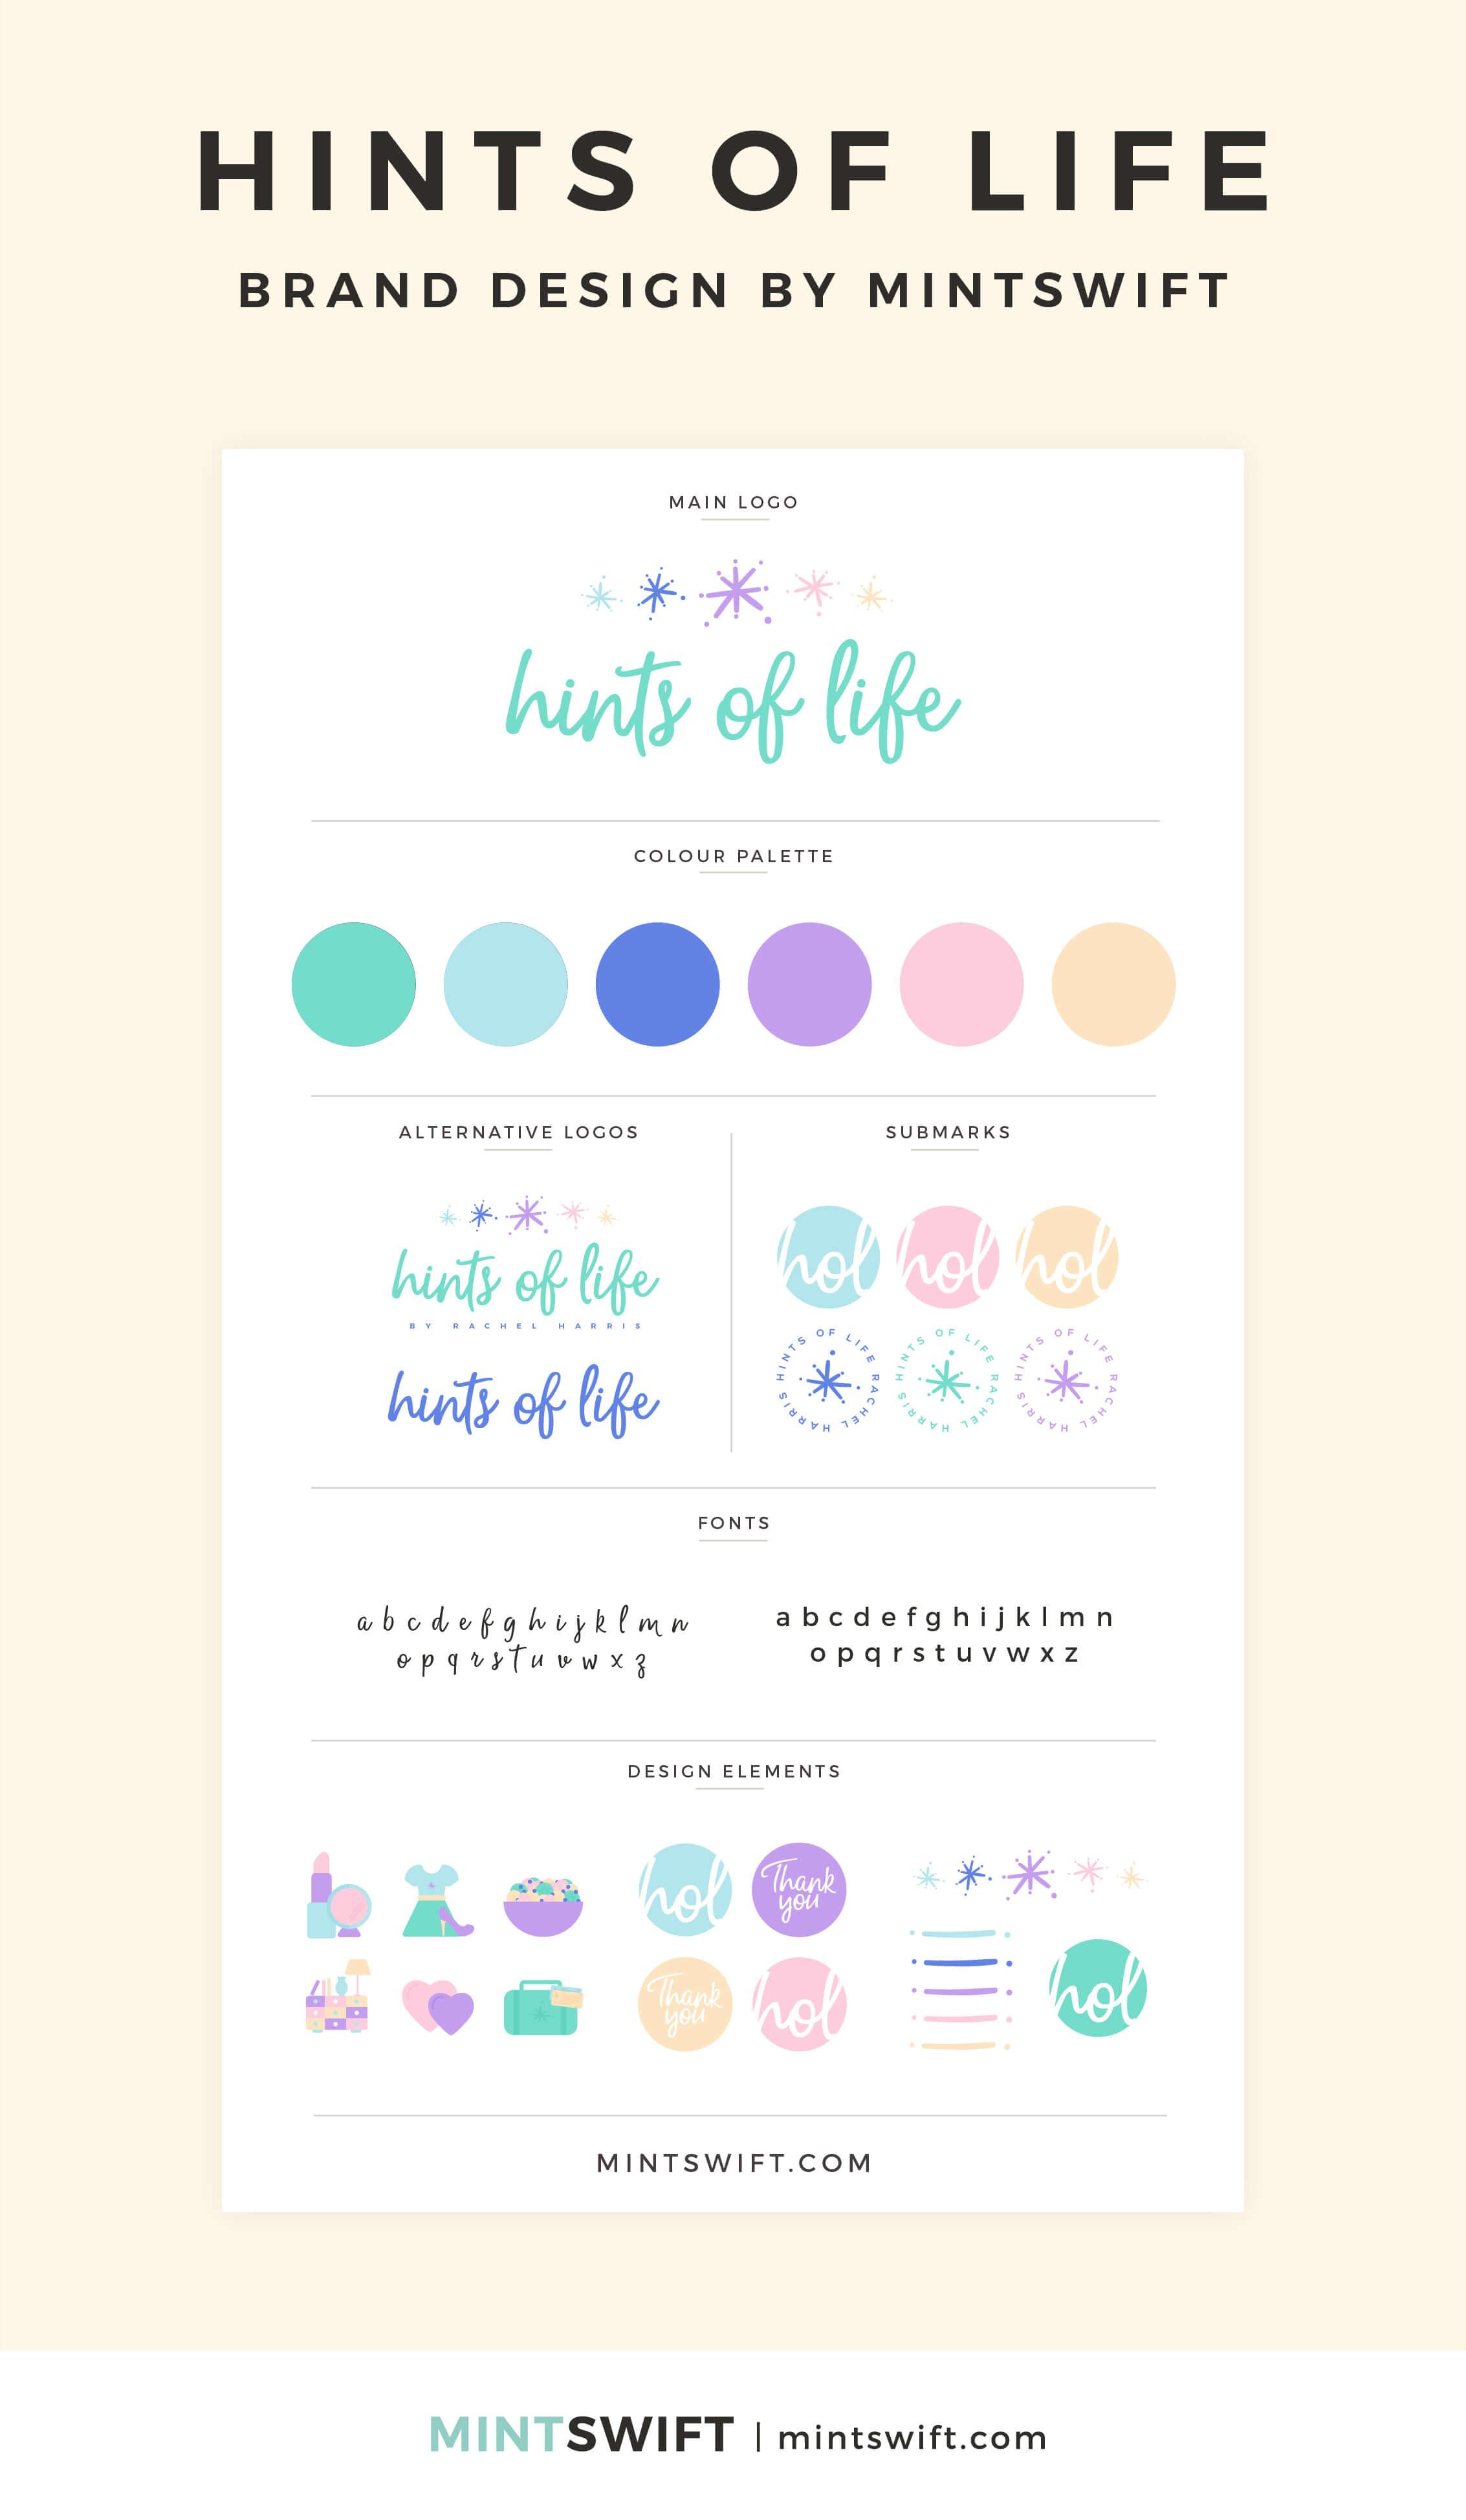 Hints of Life - Brand Design - MintSwift - Adrianna Leszczynska